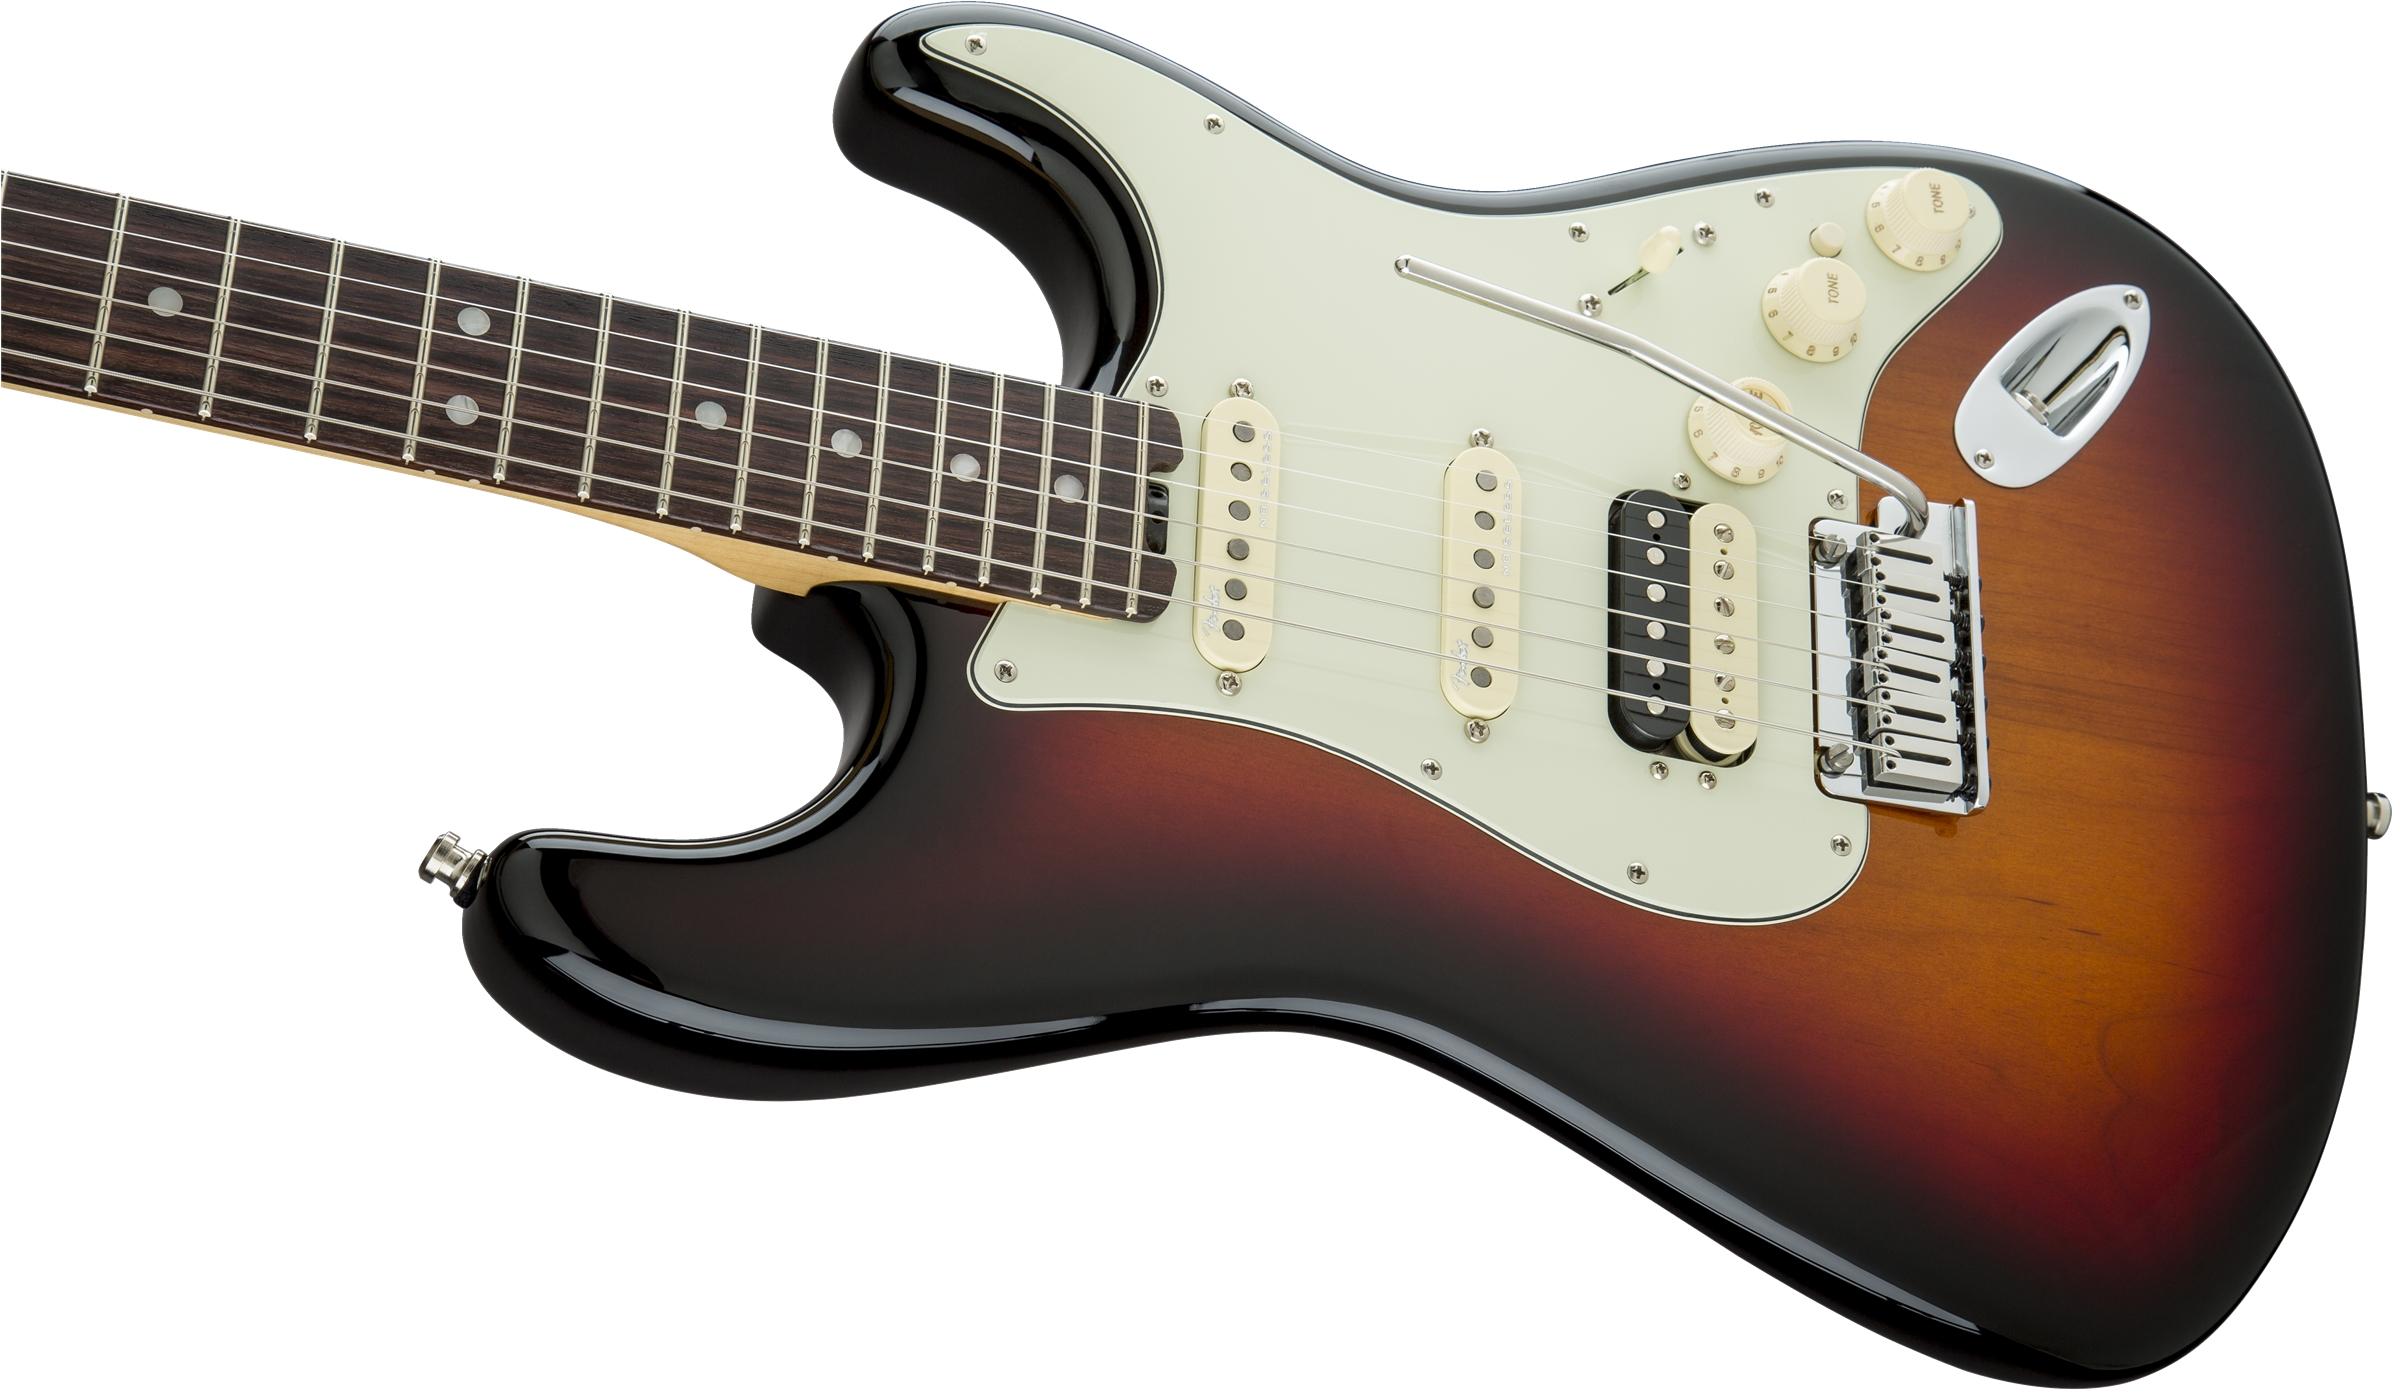 Fender American Elite Stratocaster® HSS Shawbucker 3-Color Sunburst Rosewood Fingerboard Electric Guitar